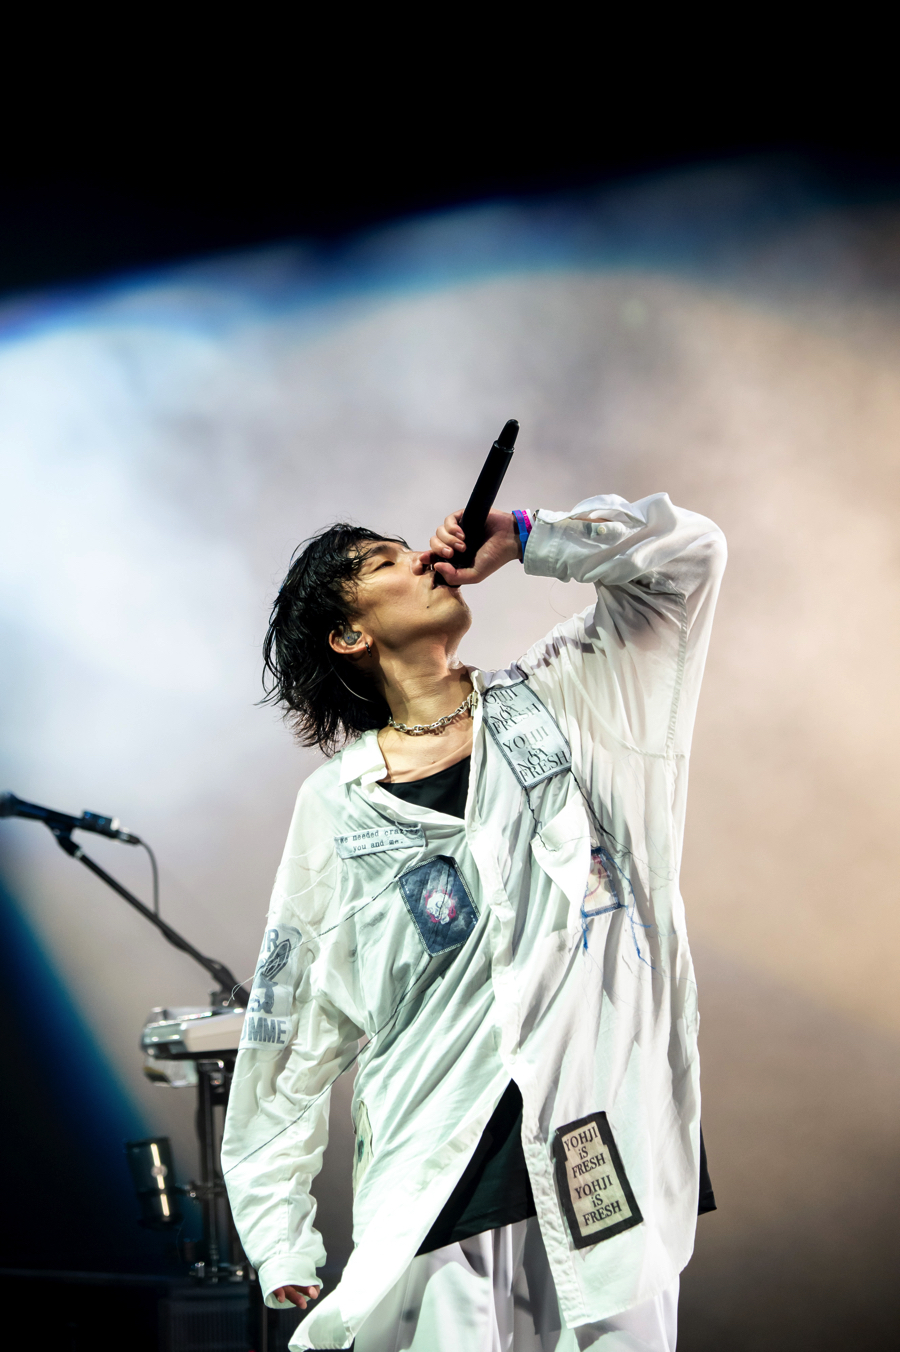 radwimps-tenkinoko-%e5%a4%a9%e6%b0%97%e3%81%ae%e5%ad%90-live-concert_9-2